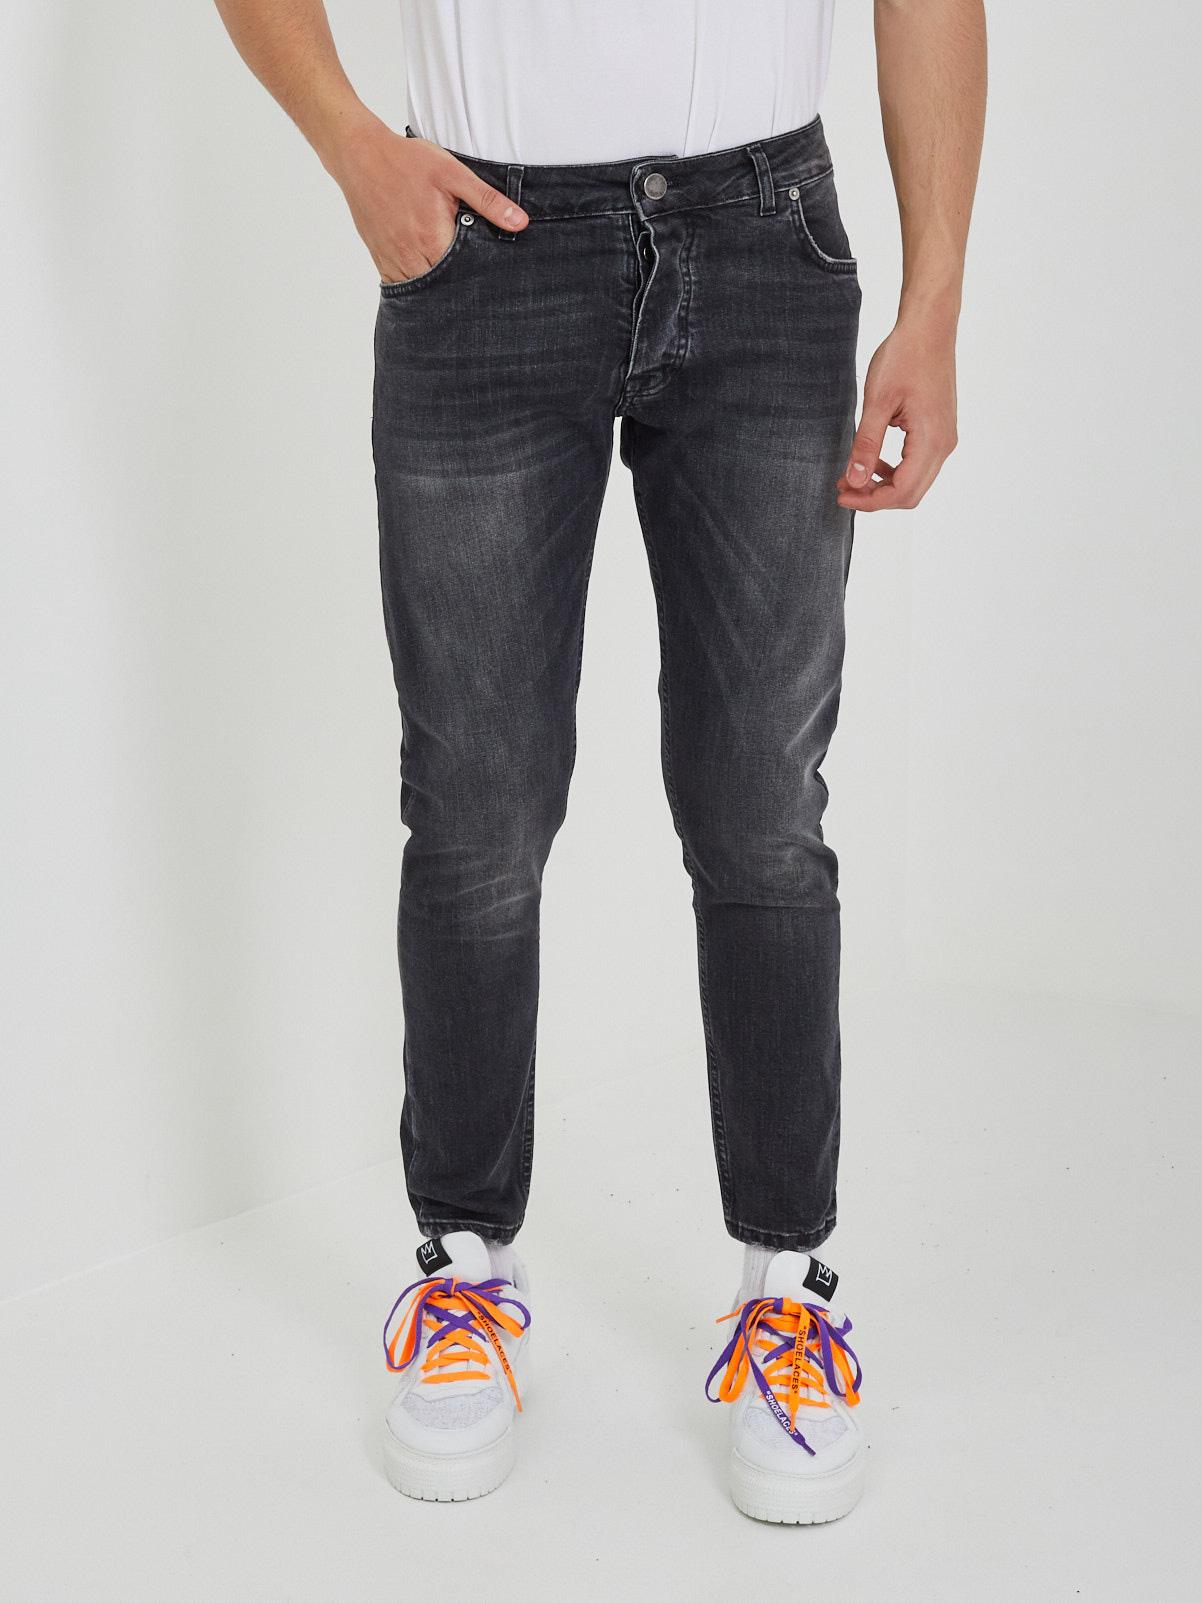 Jeans INSANITY | Jeans | BARINERO